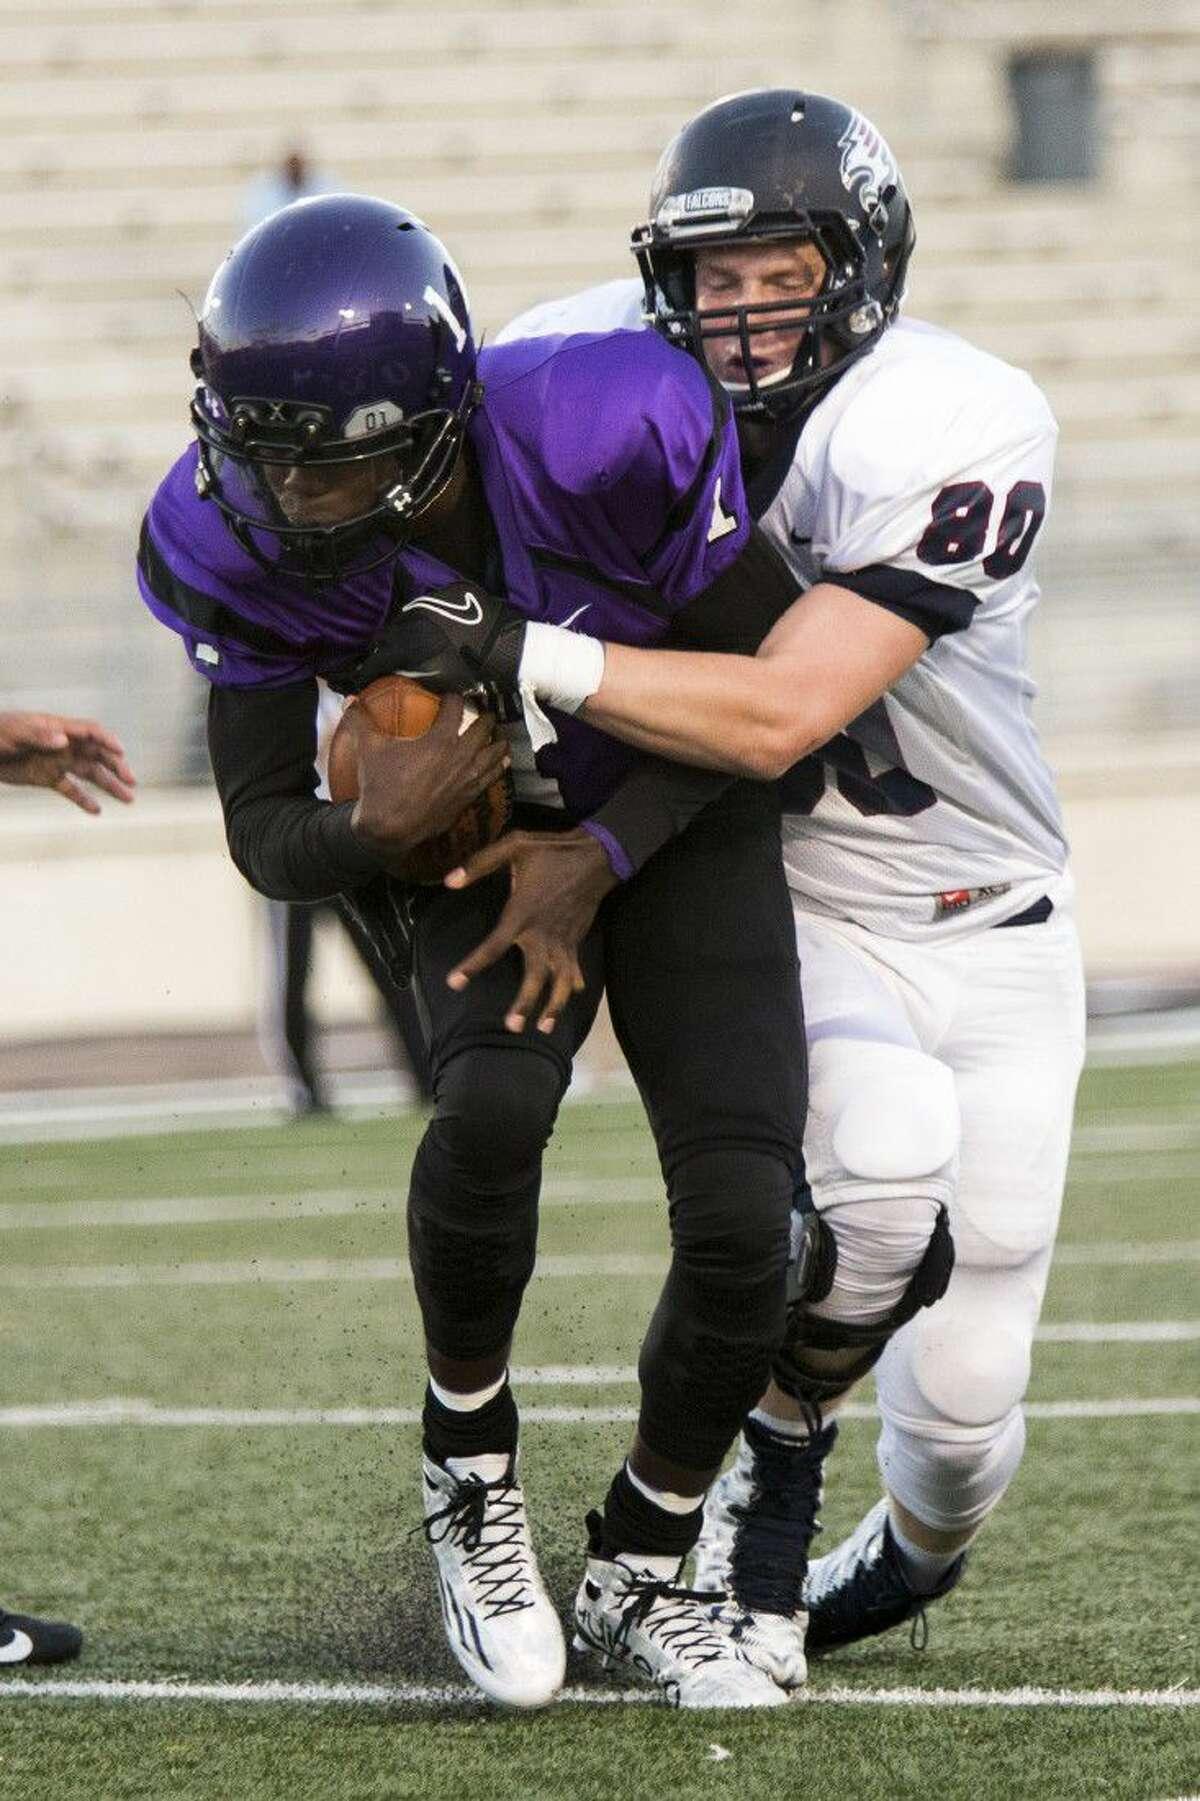 Tompkins linebacker Noah Kalbfleisch (80) sacks Humble quarterback Terrance Gipson (1) during their 2015 season opener. The Falcons earned the first three wins in program history and return 11 starters seeking more.